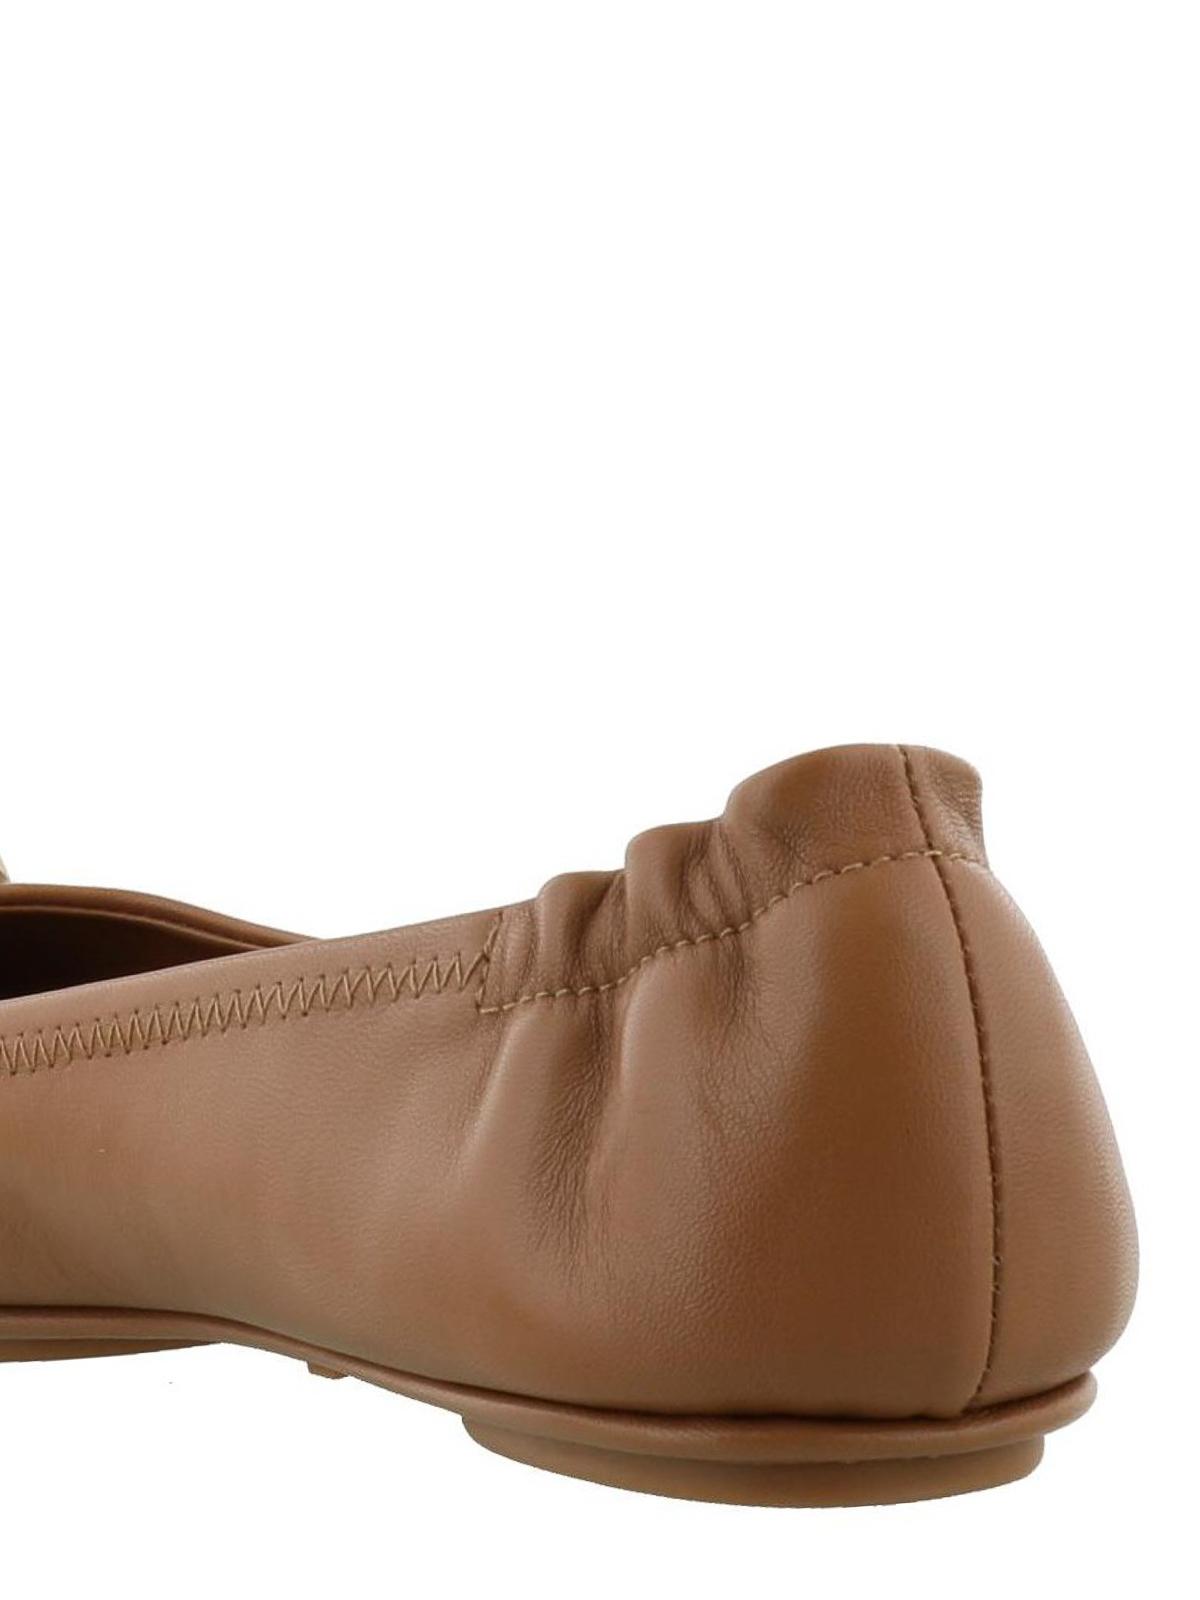 63a7877a64ffb3 Tory Burch - Minnie Travel ballet flats - flat shoes - 32880 232